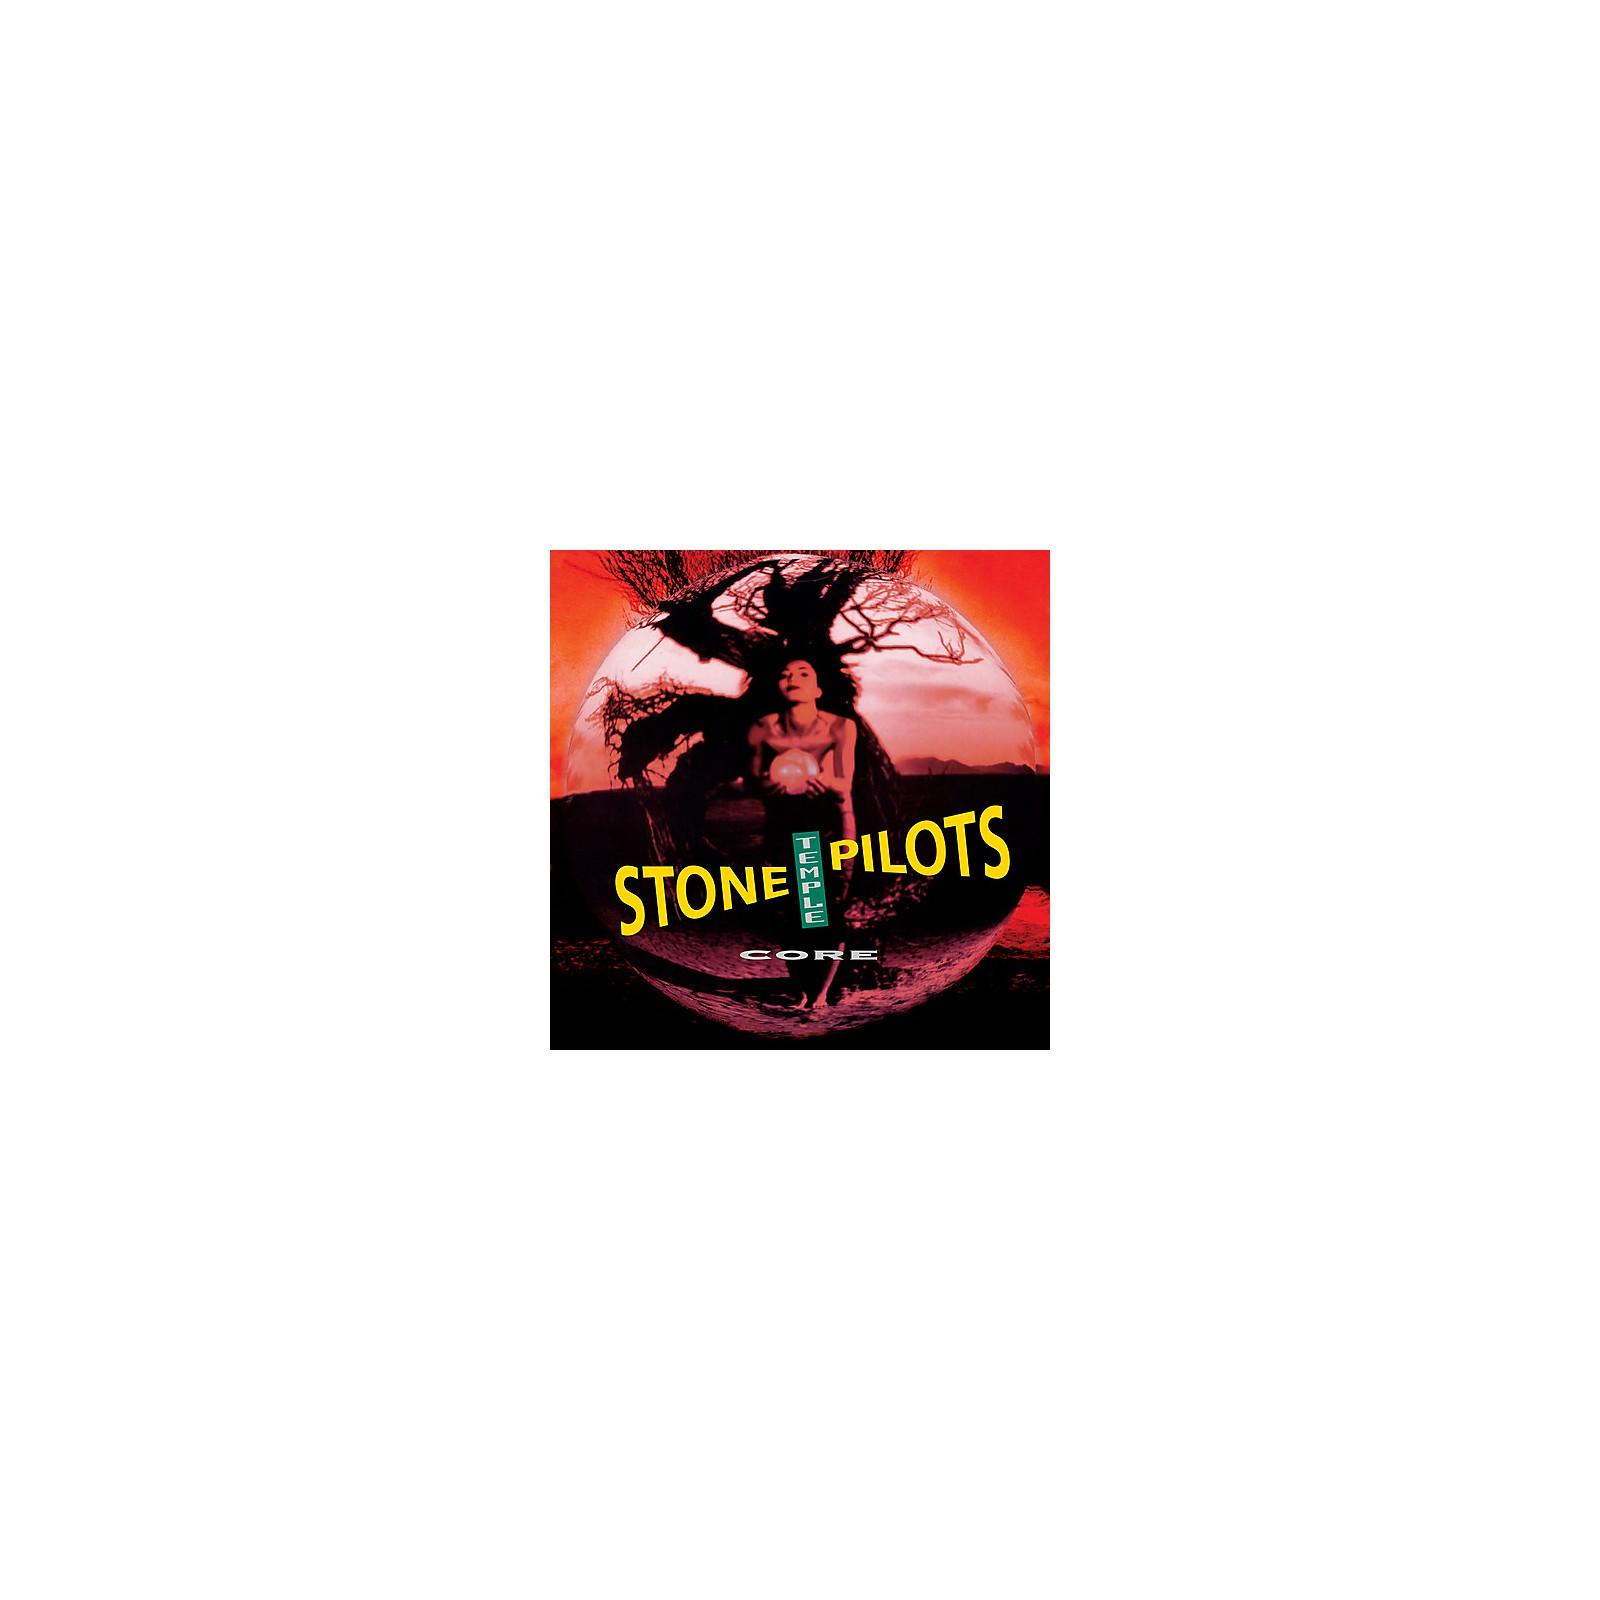 Alliance Stone Temple Pilots - Core (CD)